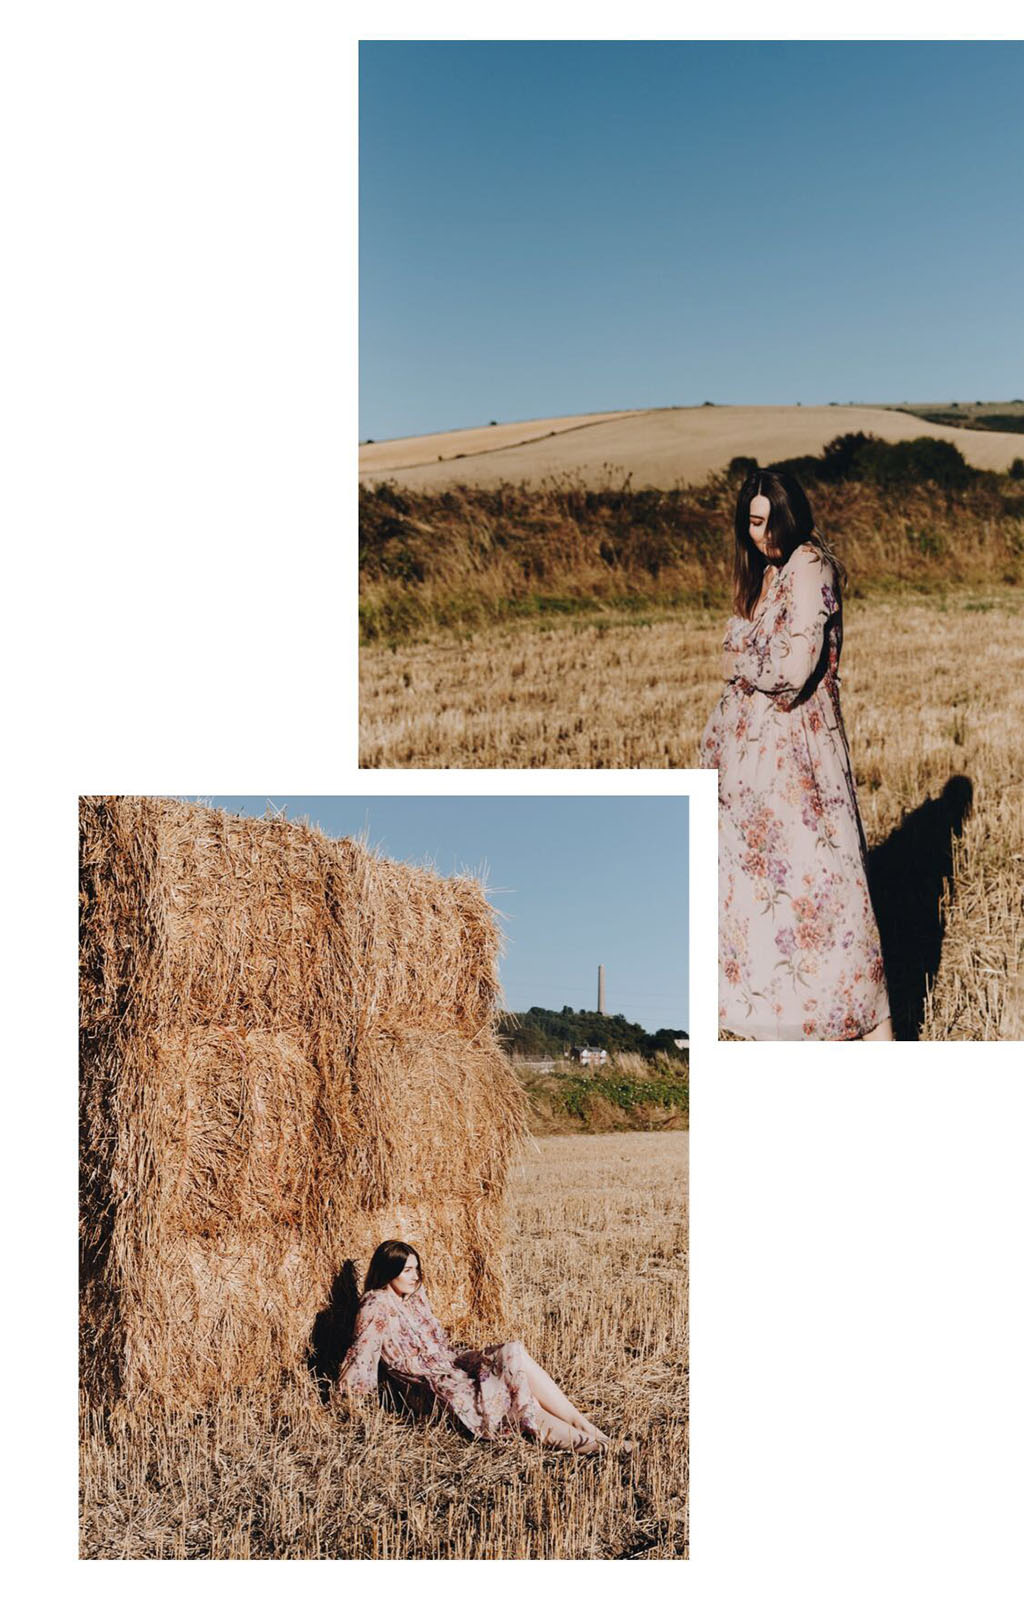 hm floral dress lareese craig brighton blogger www.lareesecraig.com fashion blogger